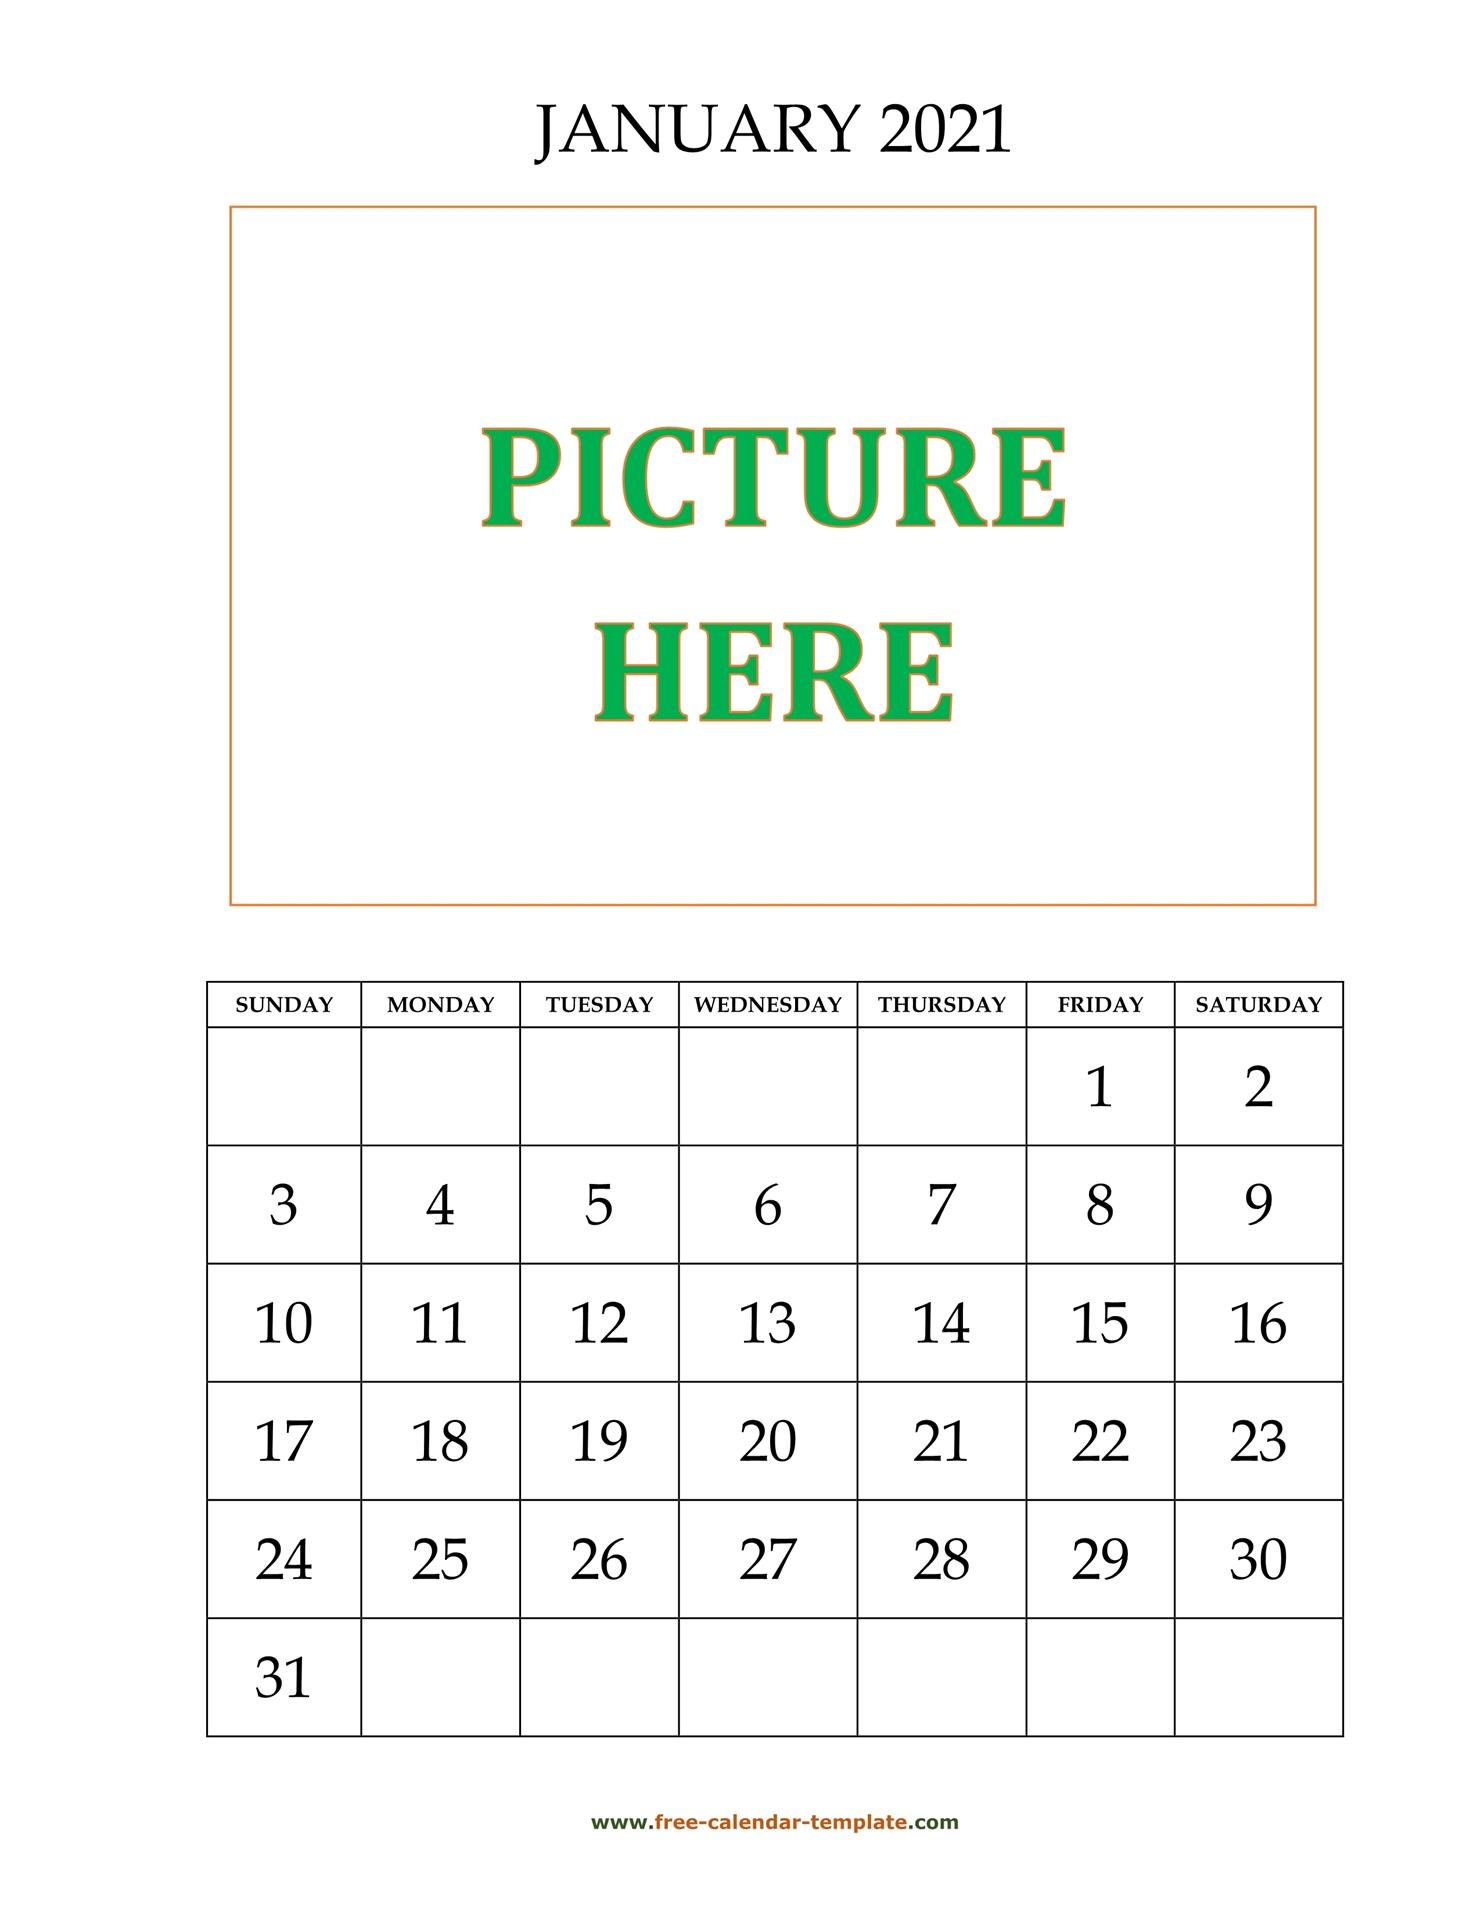 January 2021 Free Calendar Tempplate Free Calendar